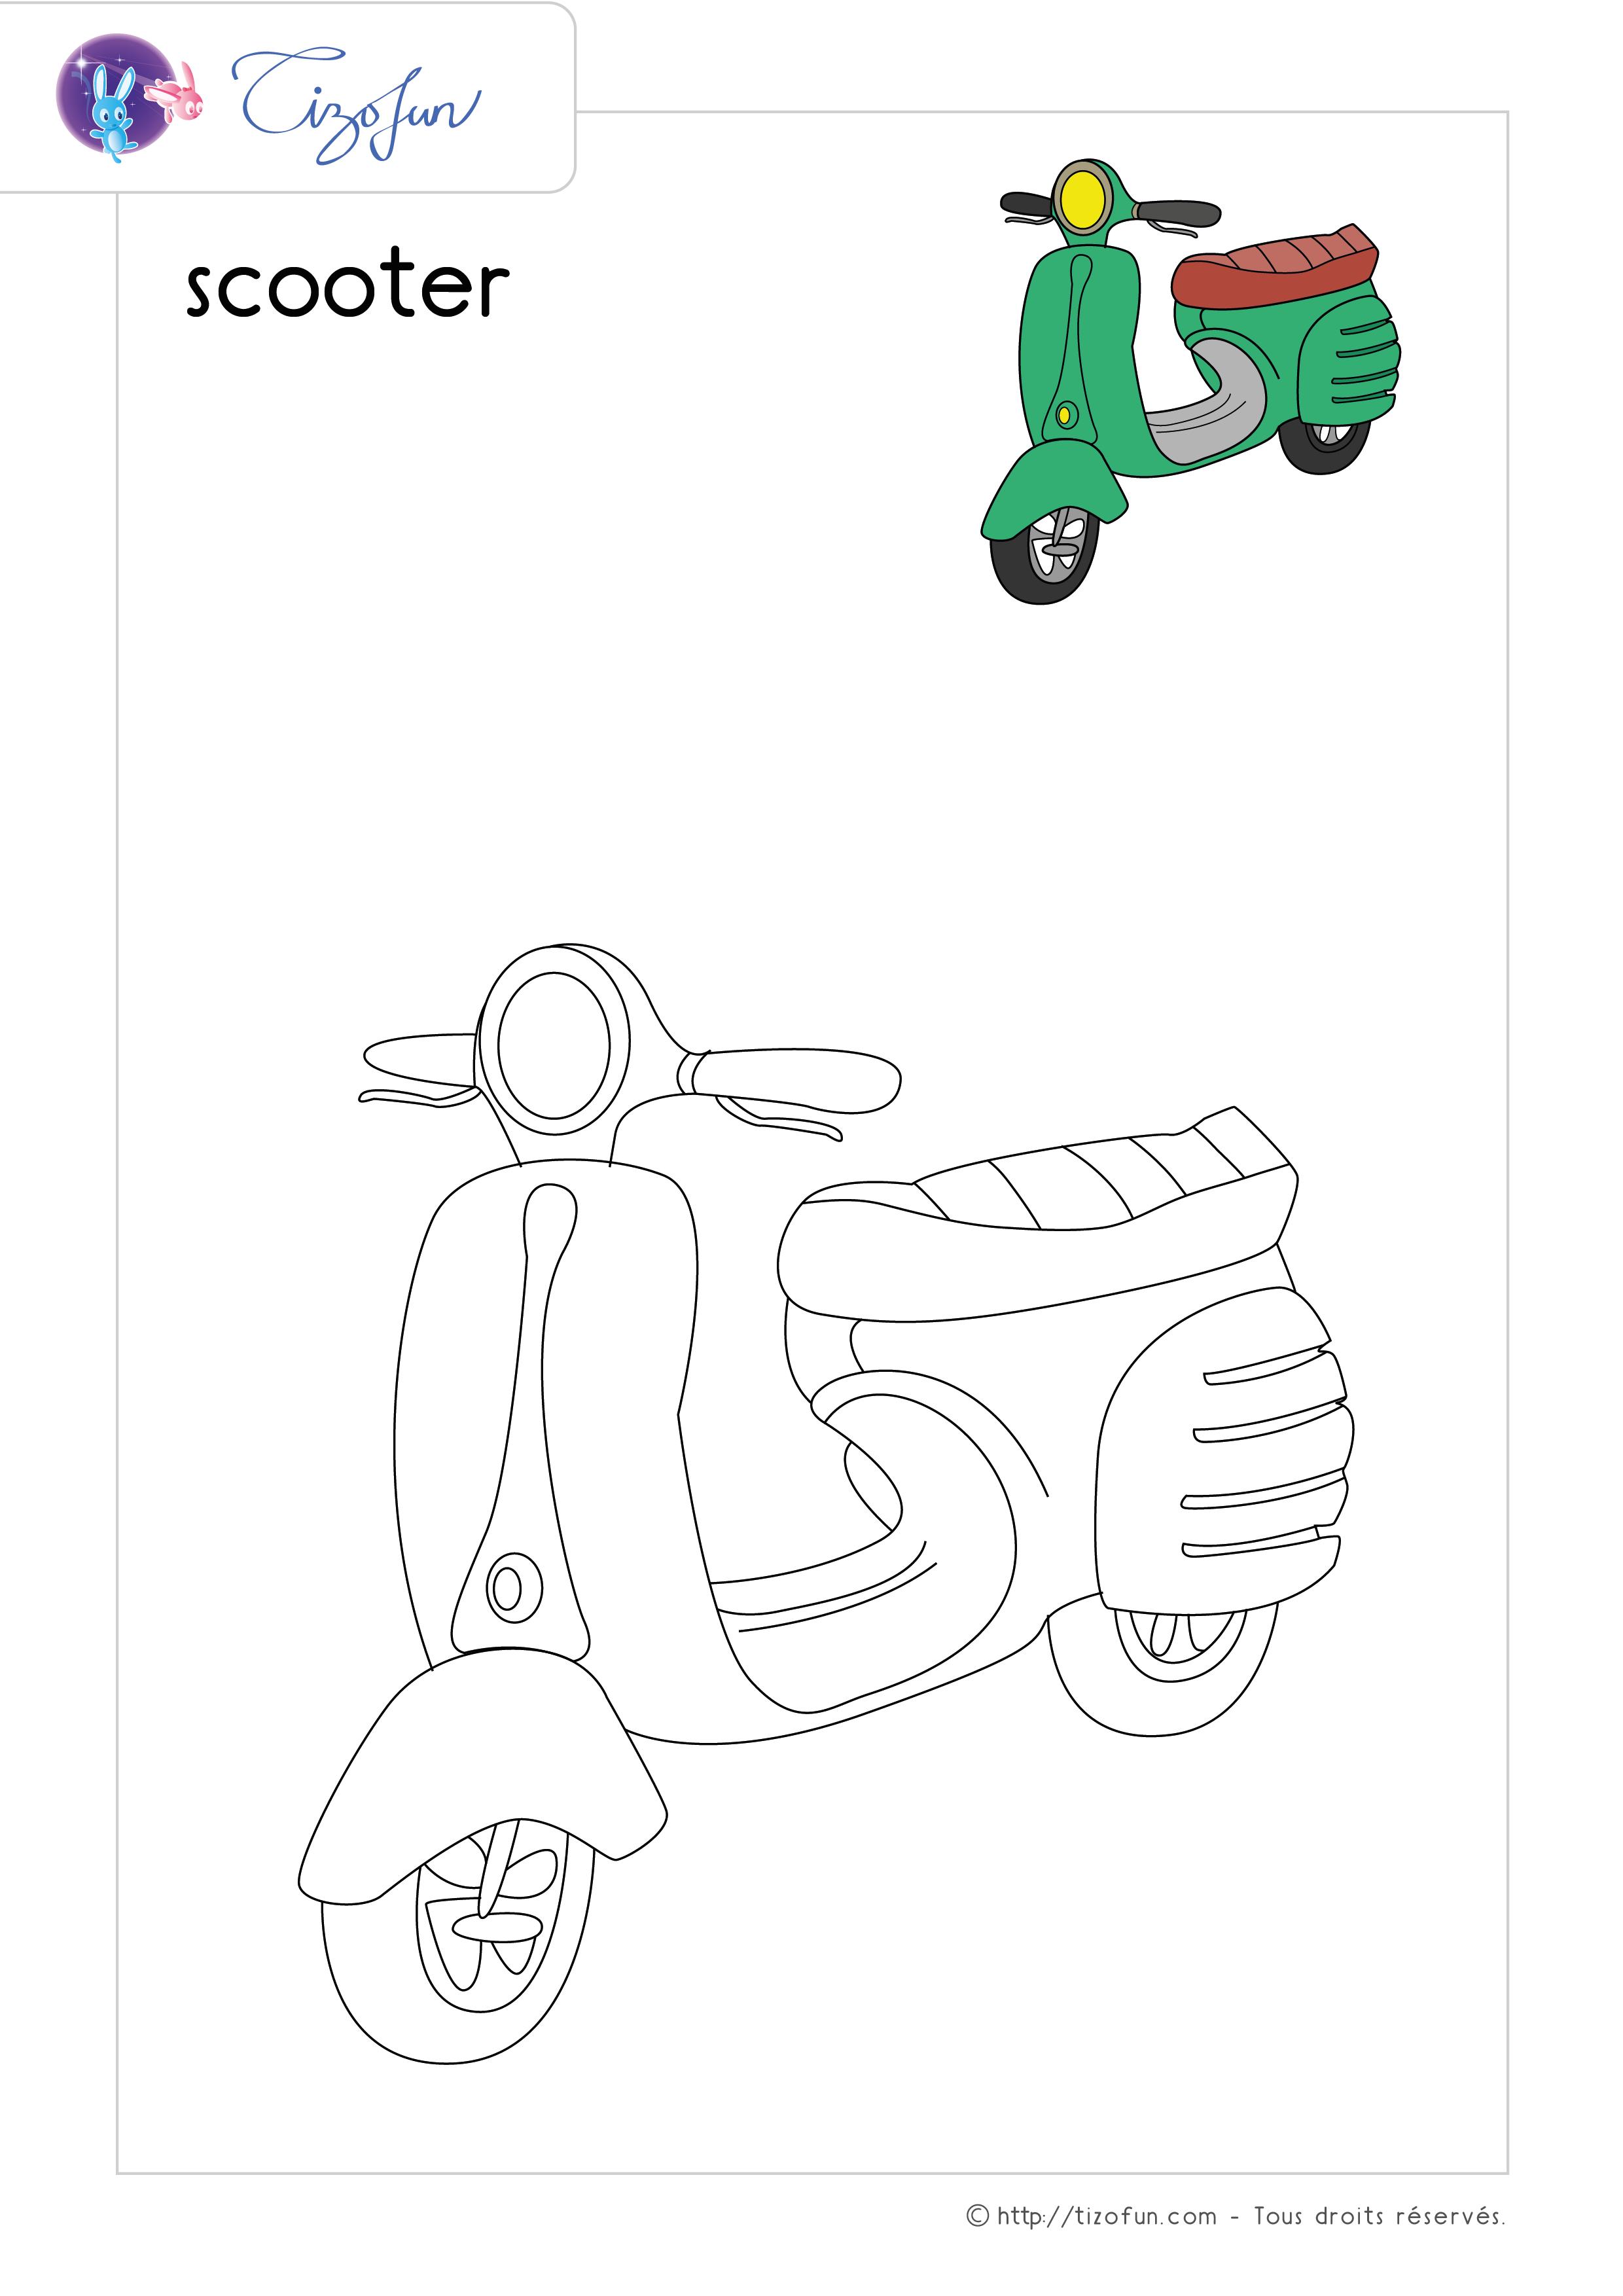 Coloriage Transport Dessin Scooter Dessin Croquis Amour Coloriage